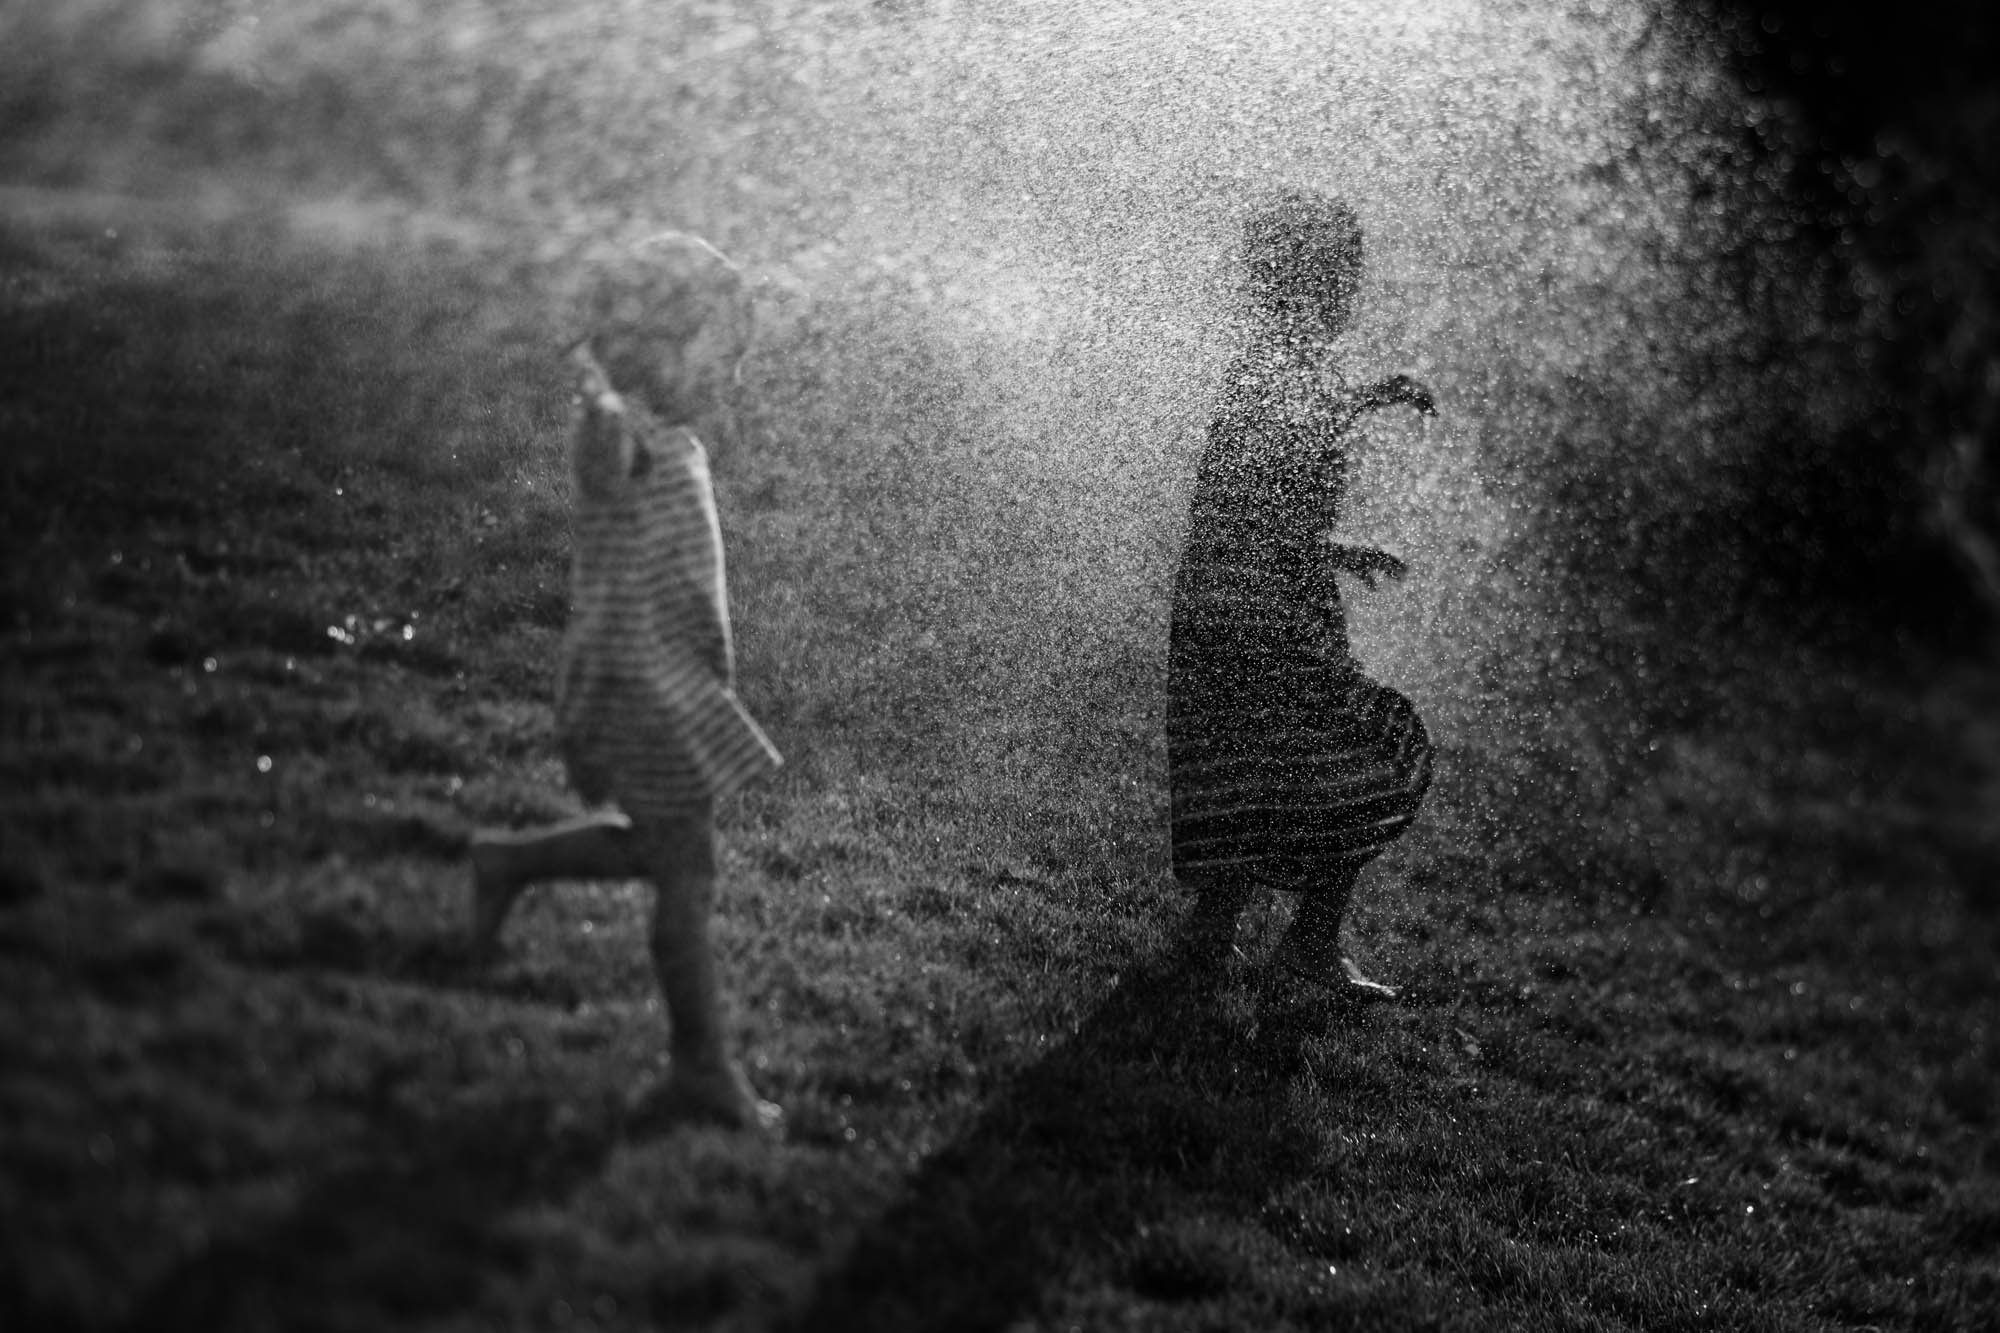 girls playing in sprinklers